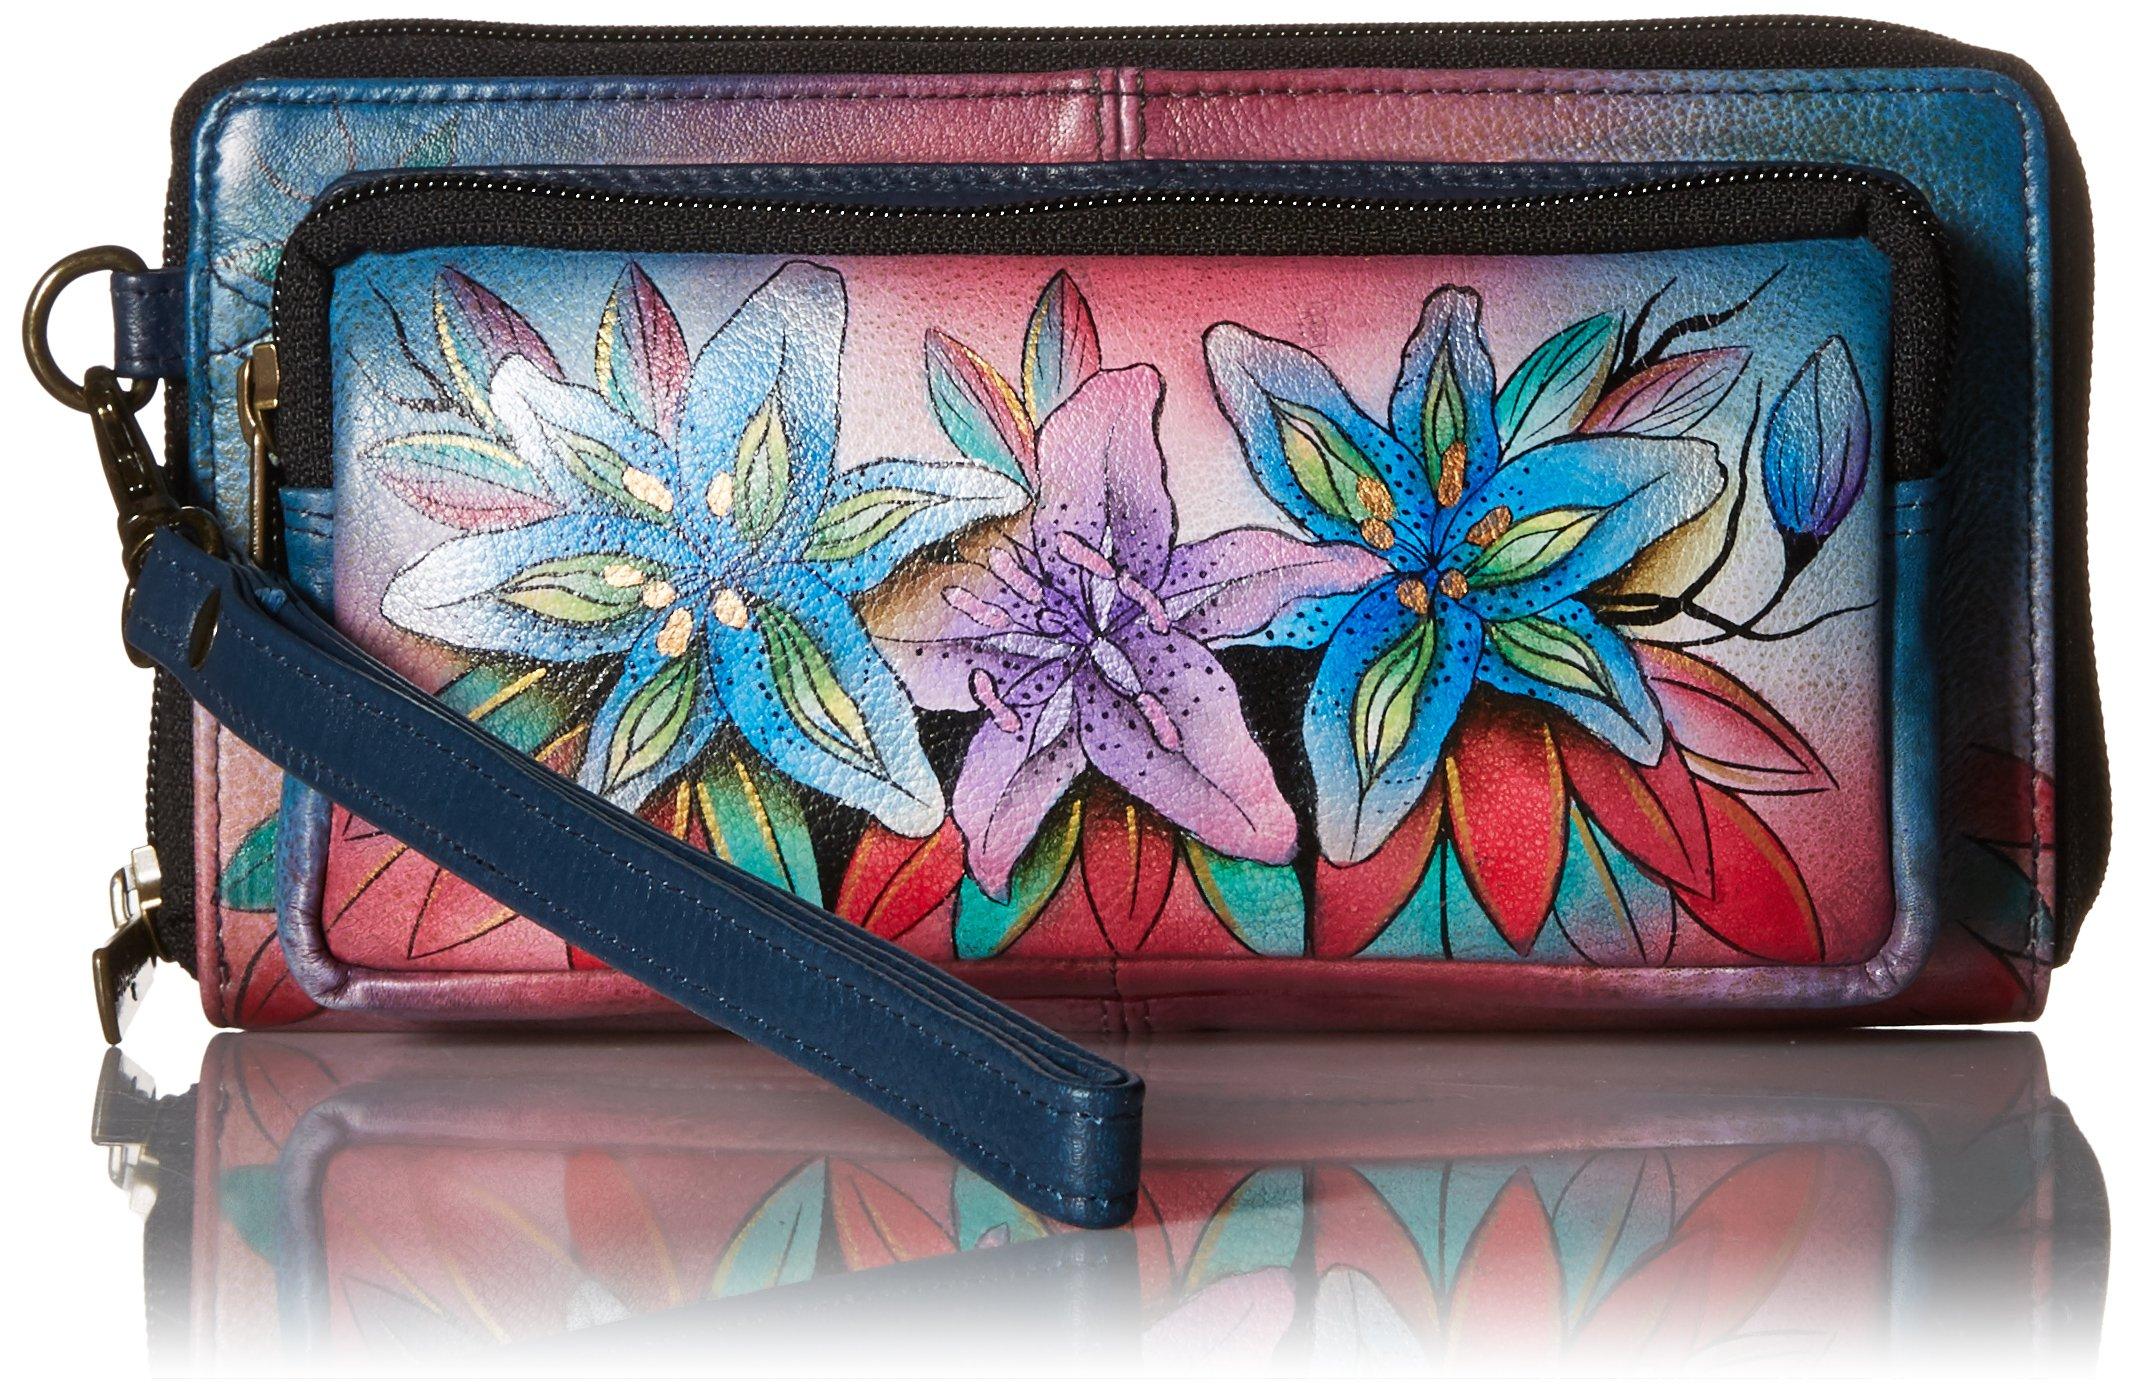 Anuschka Handpainted Leather Women's Rfid Blocking Zip Around Wallet